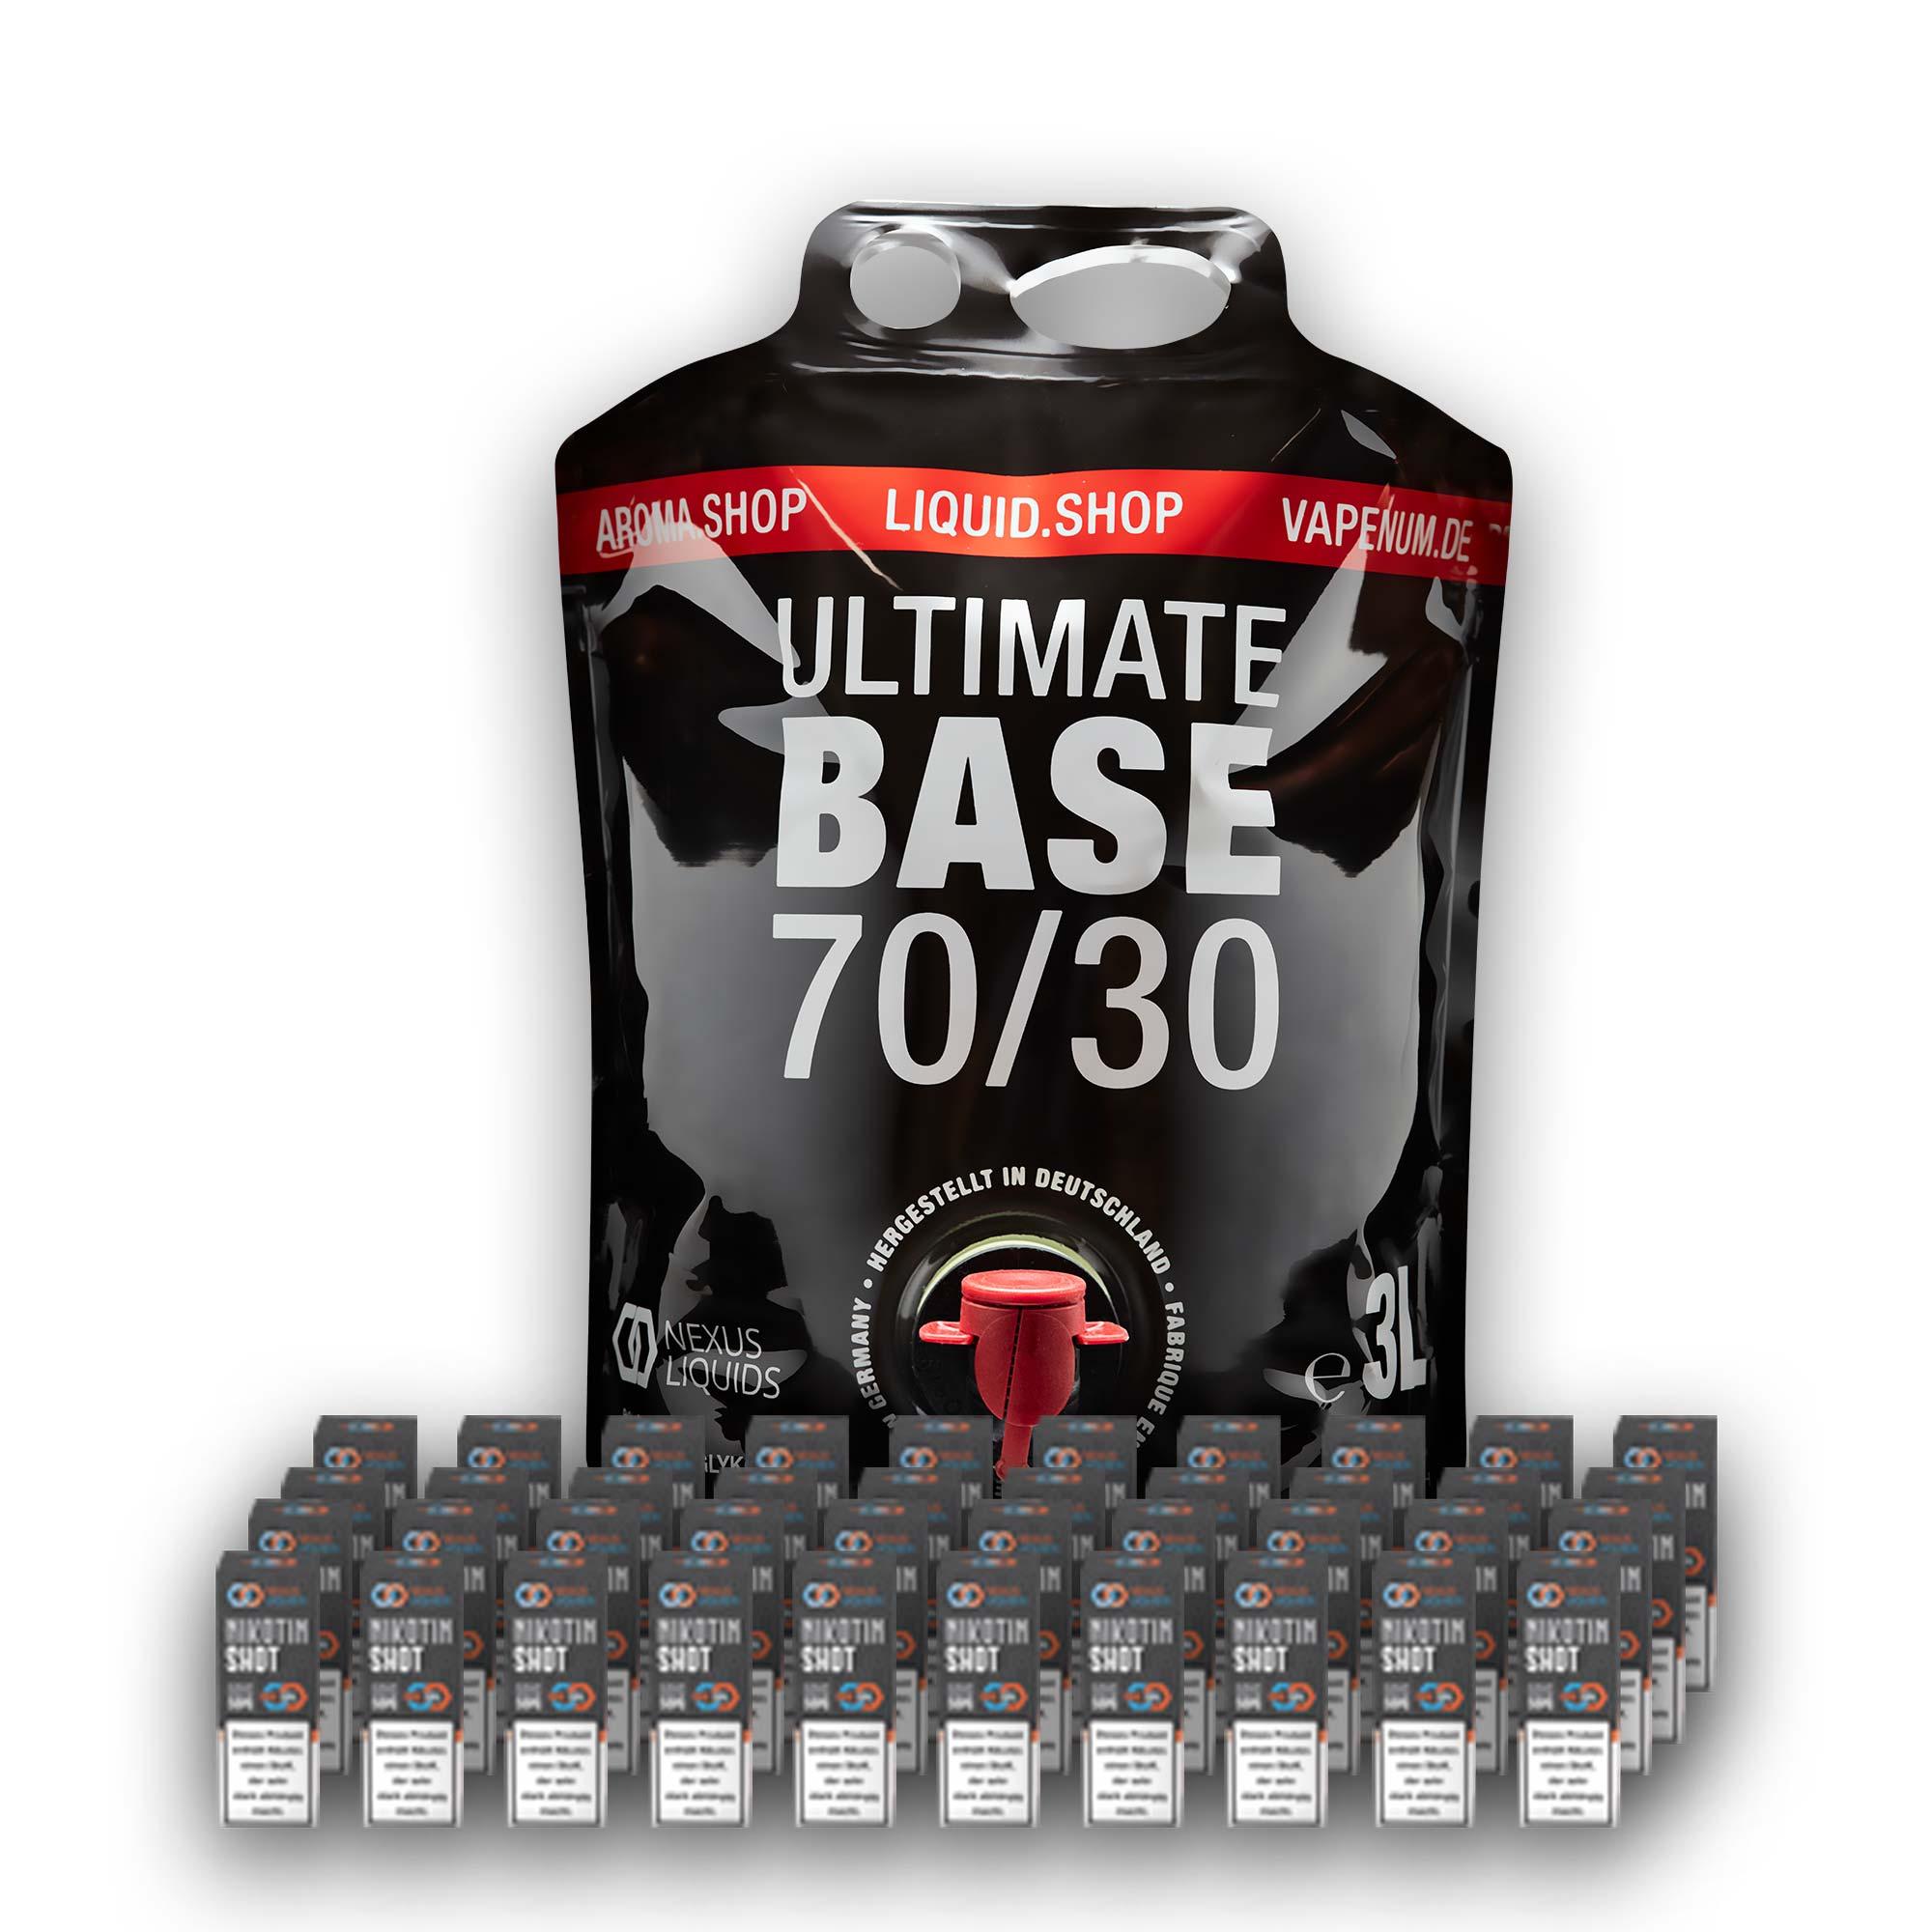 3L Ultimate Base (70/30) inklusive 40 Nik Shots 18mg